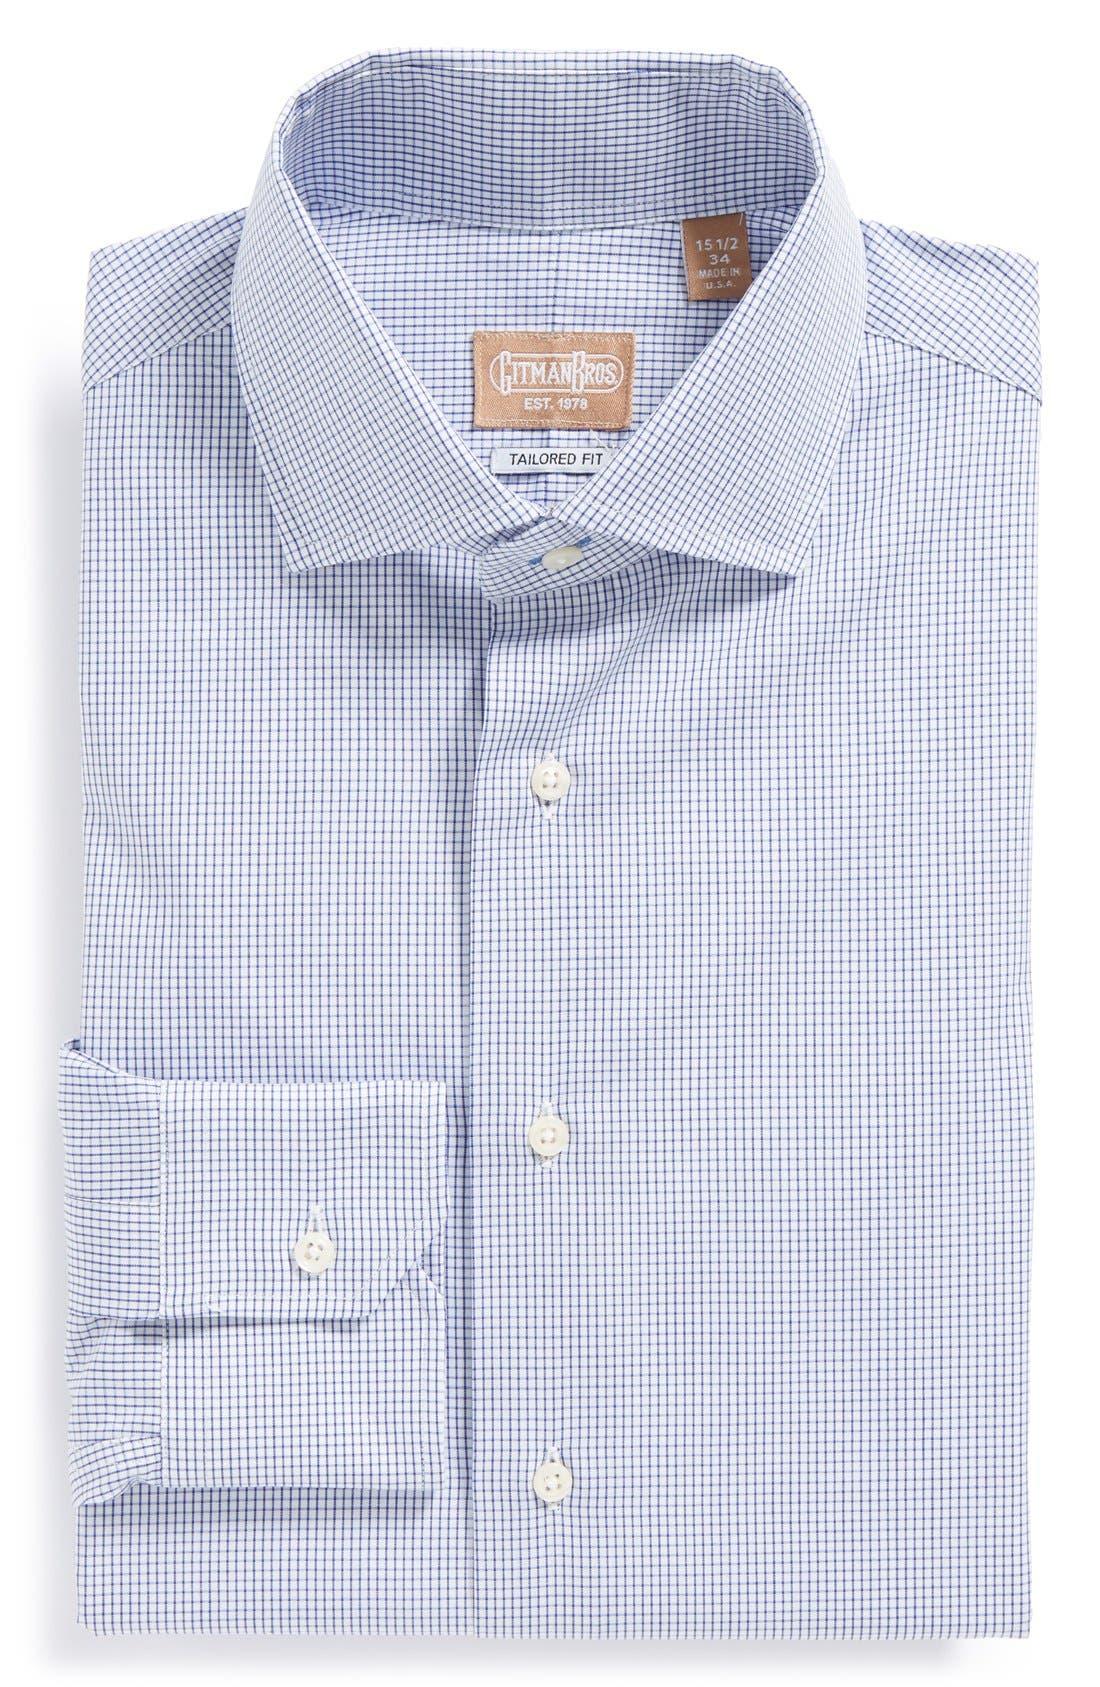 GITMAN Tailored Fit Gingham Dress Shirt, Main, color, NAVY